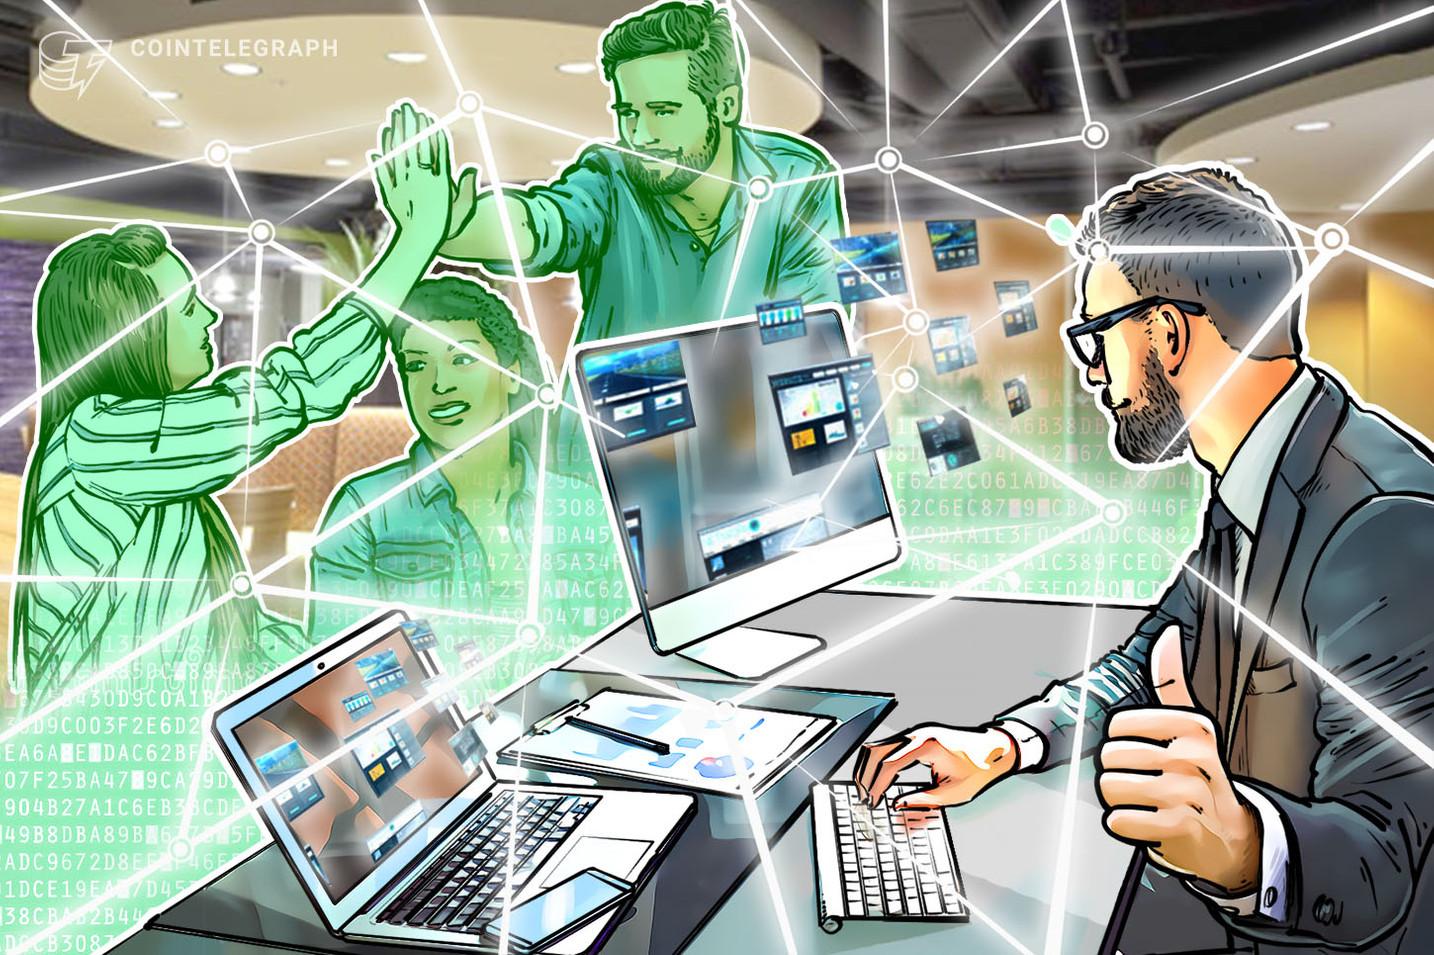 Salesforce Introduces Hyperledger-Based Blockchain Platform